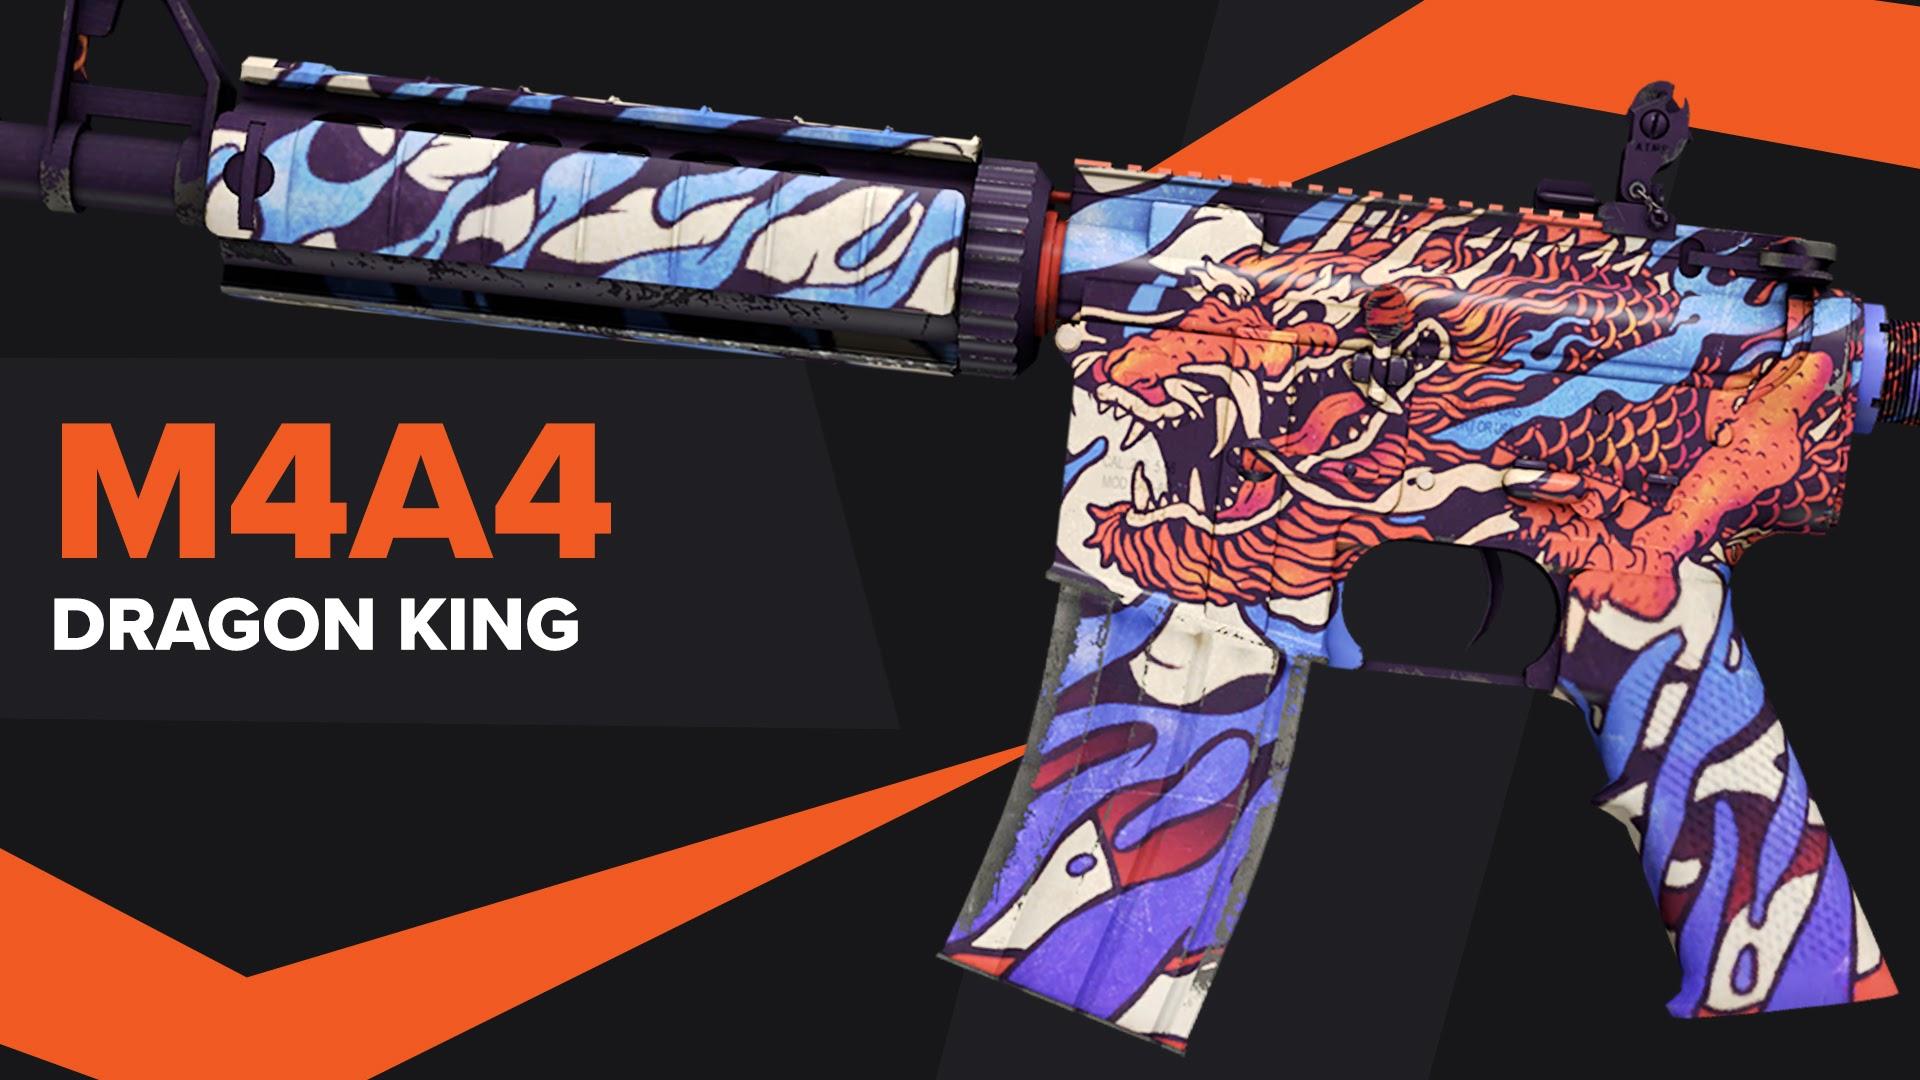 Dragon King CSGO Skin M4A4